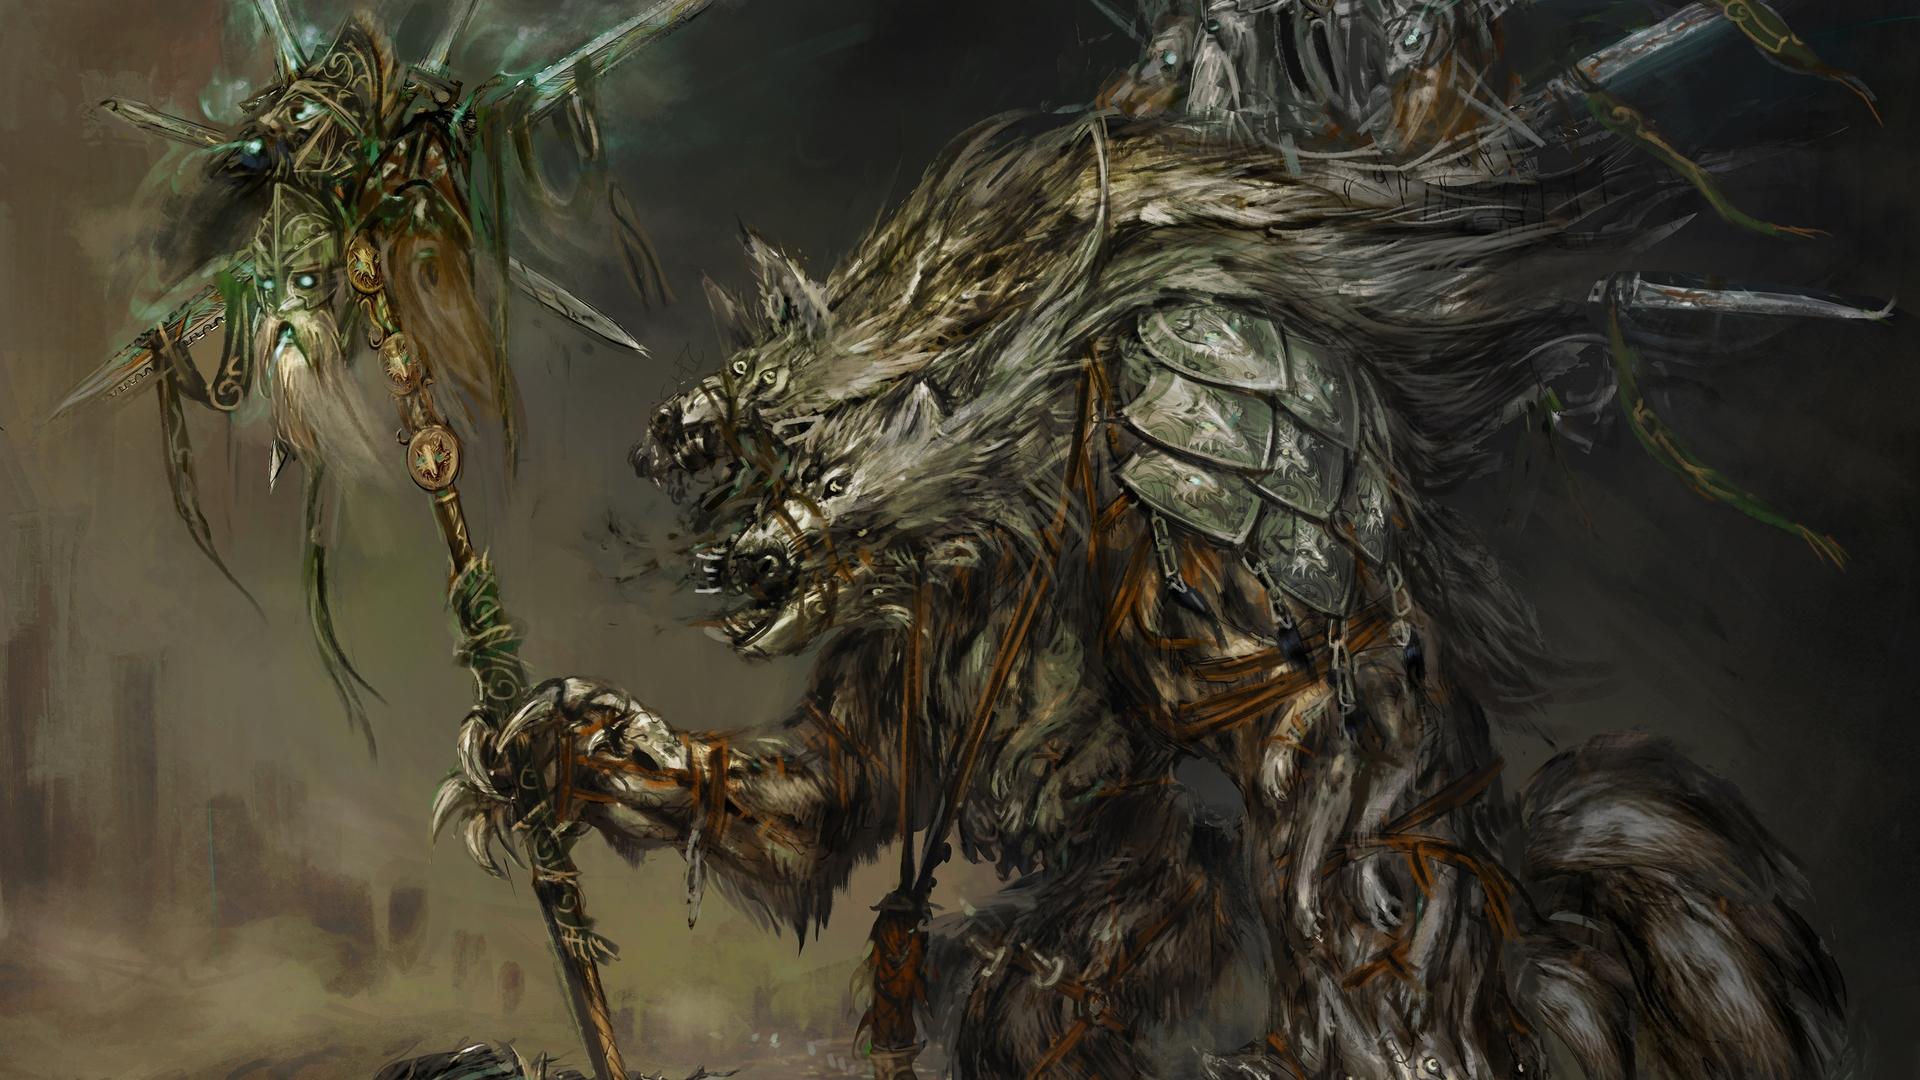 Nightmare Dwarf Divinity - Divinity Original Sin 2 Art , HD Wallpaper & Backgrounds